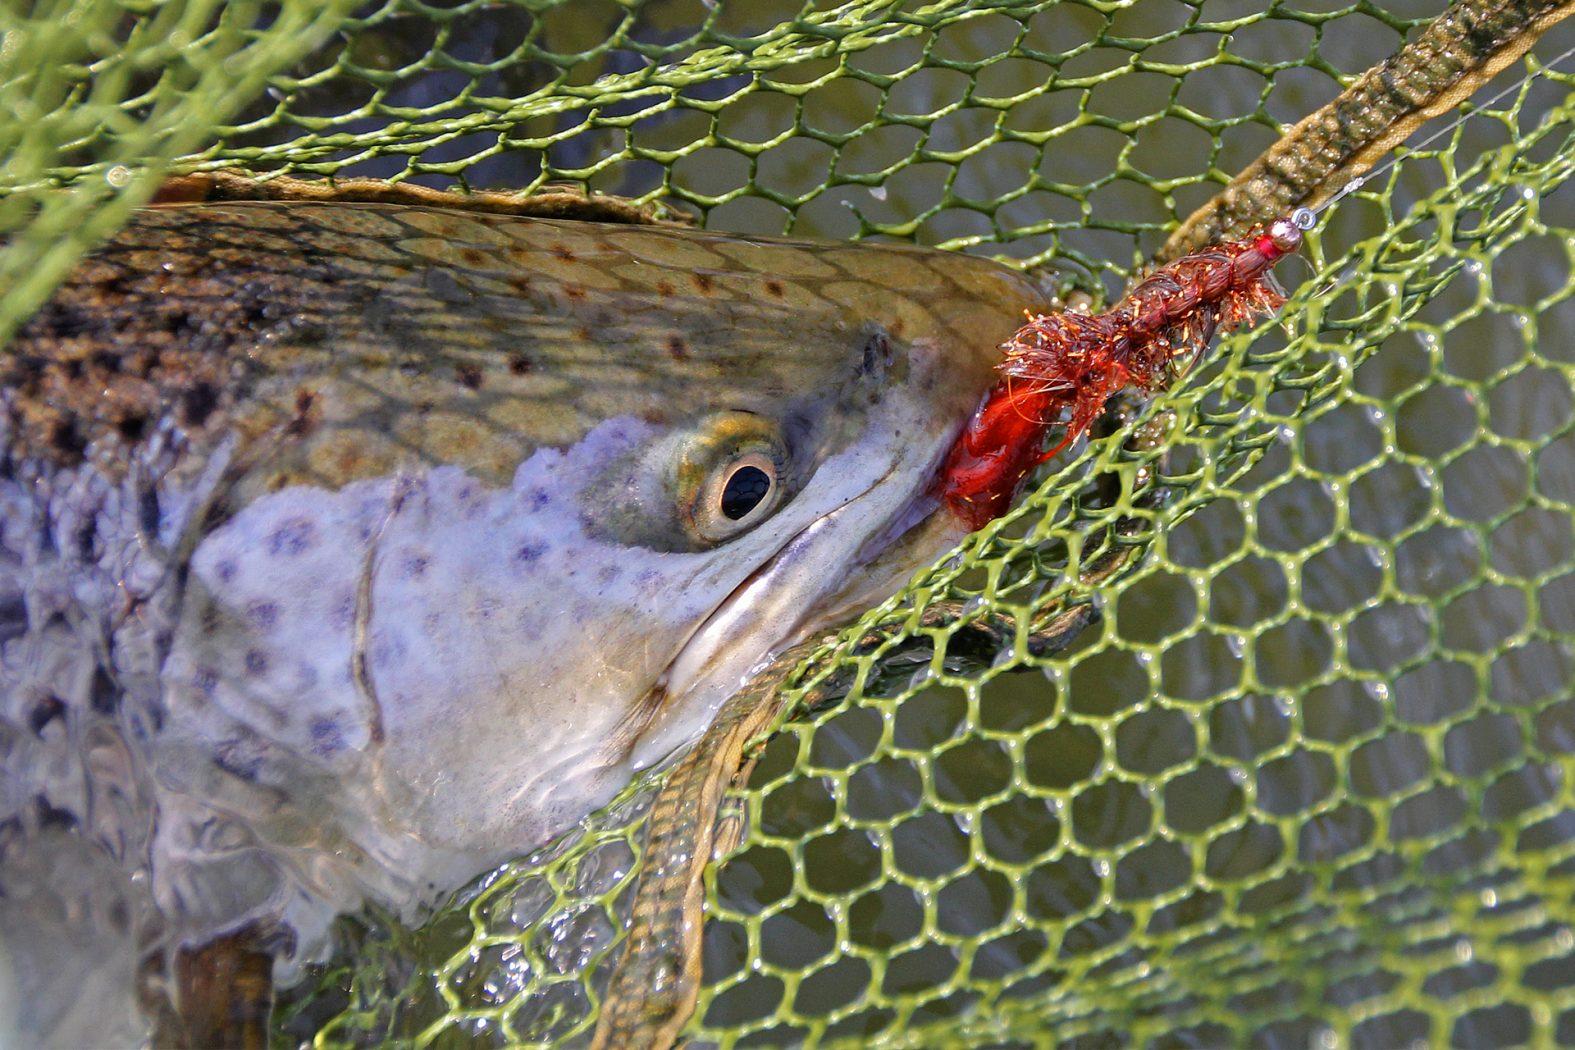 Seeringelwurm-Fliege zum Meerforellenangeln